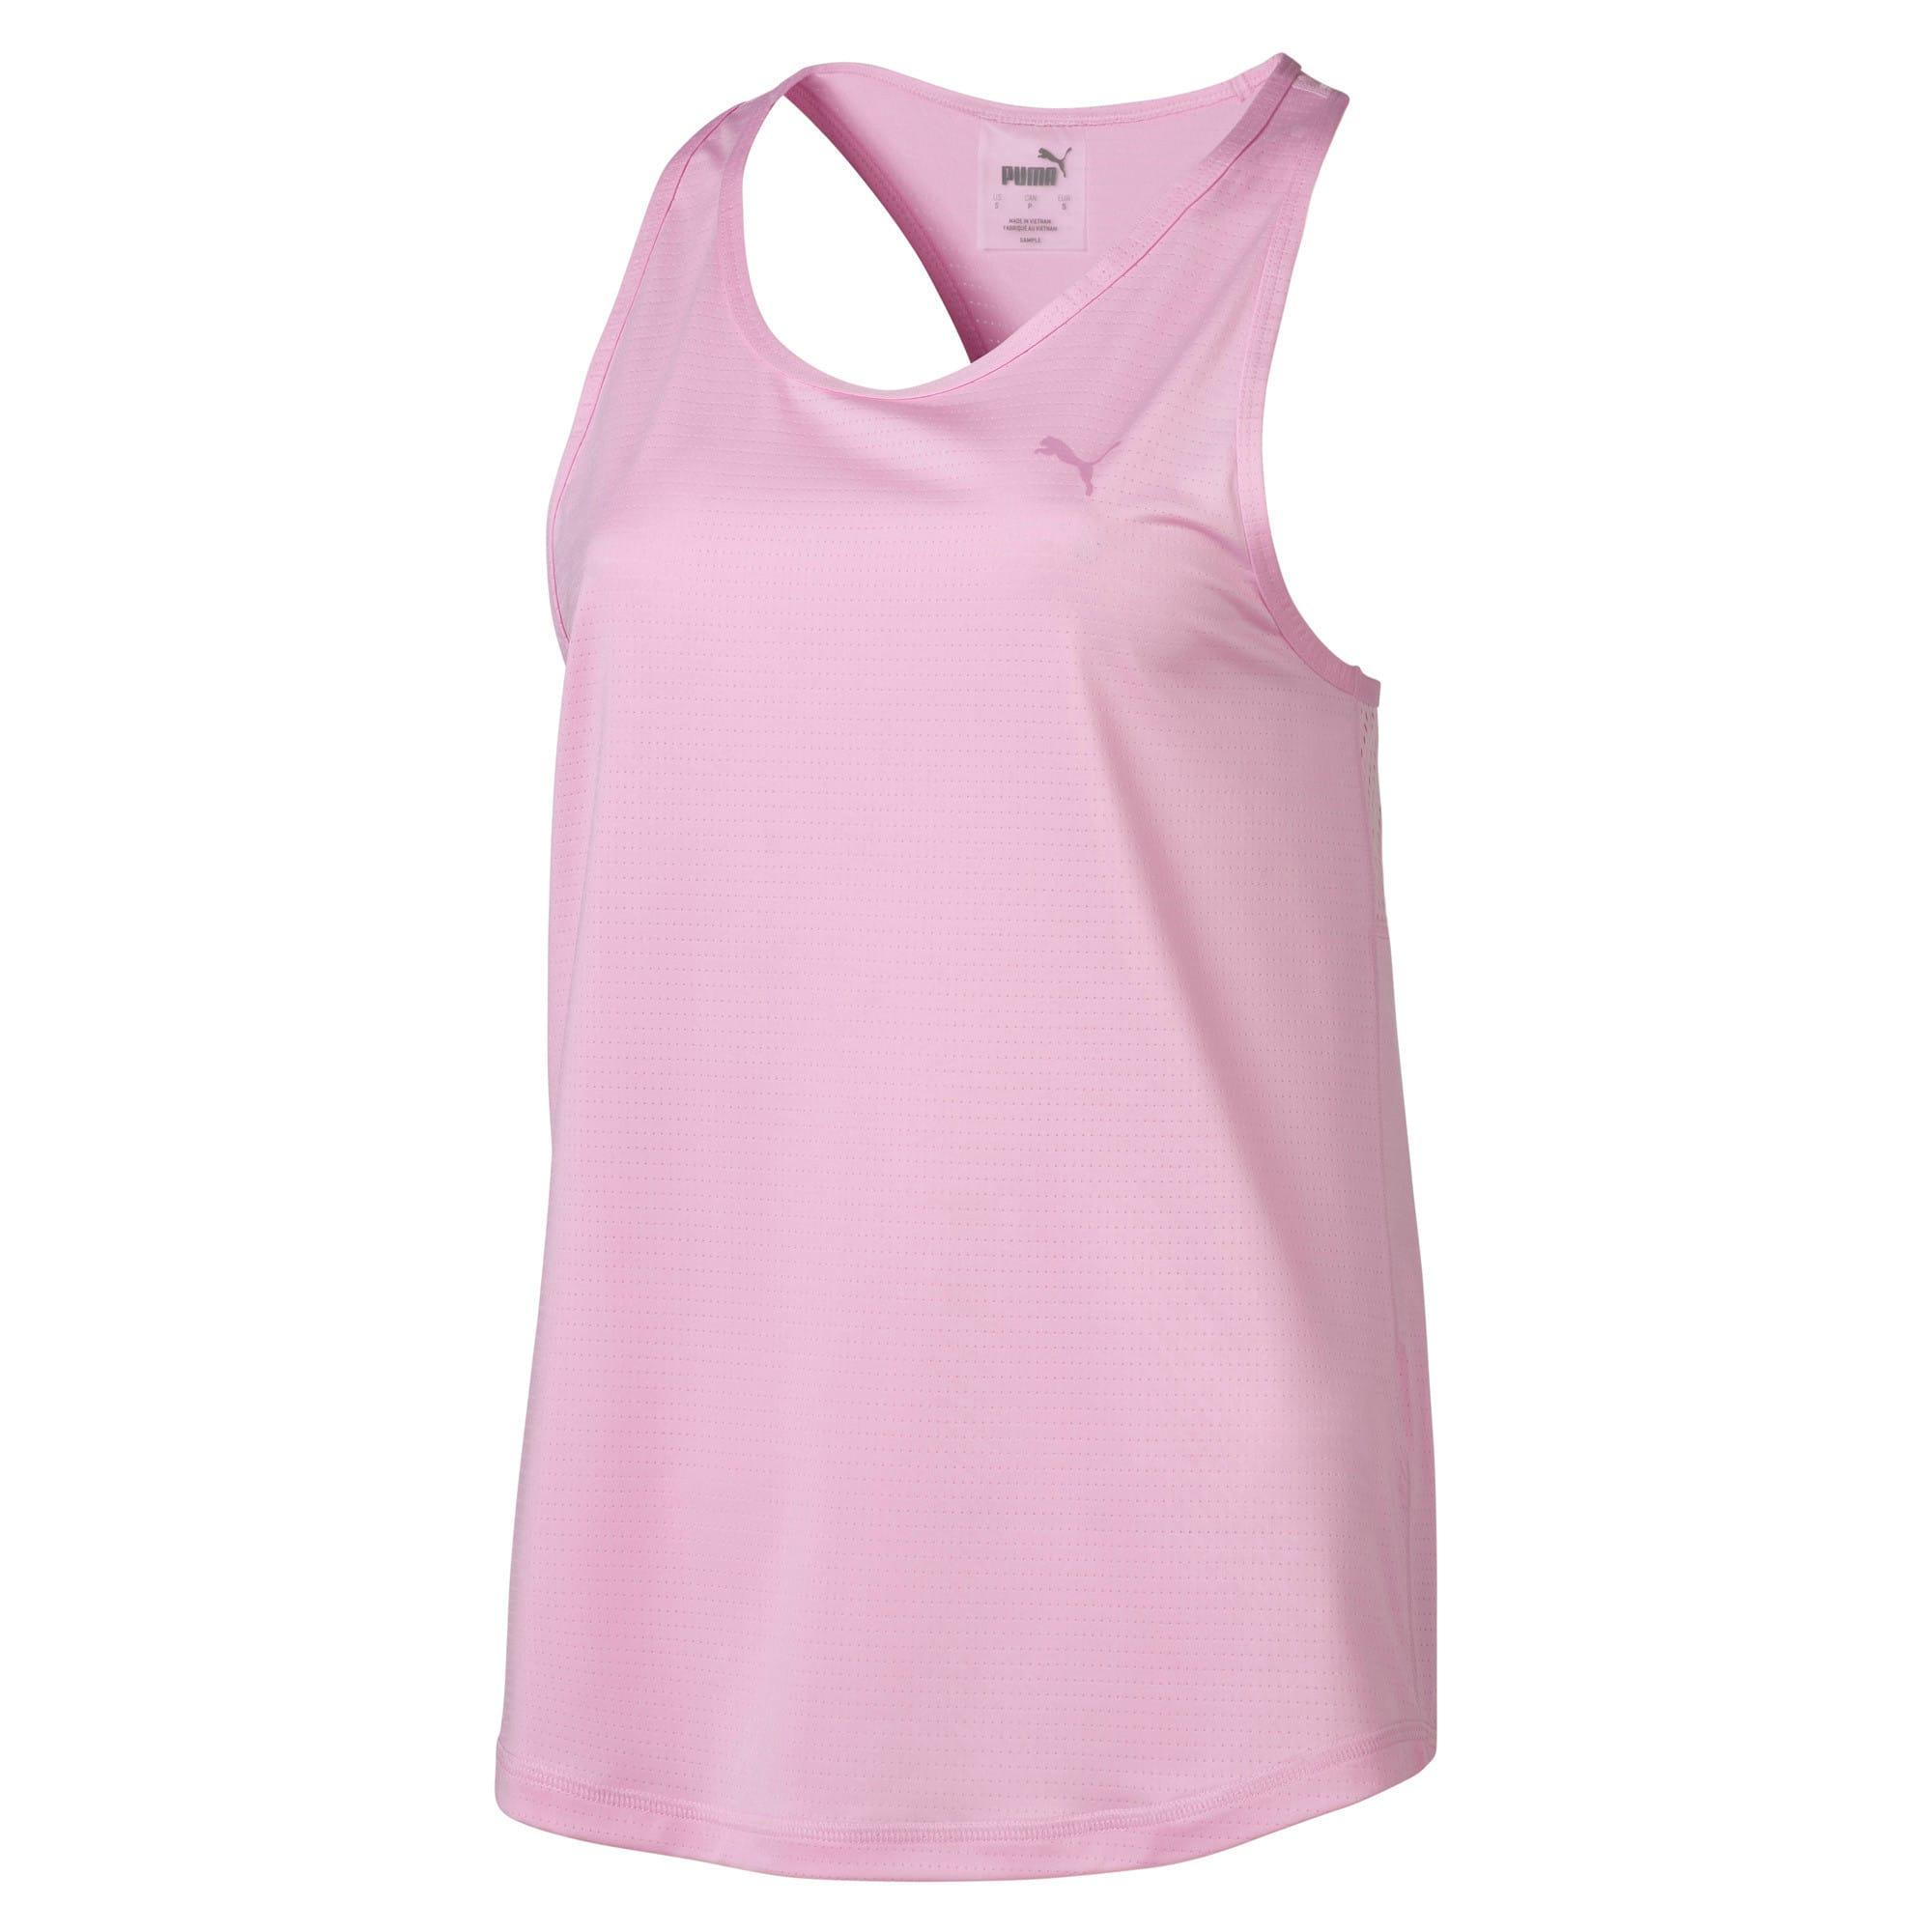 Thumbnail 4 of A.C.E. Raceback Women's Training Tank Top, Pale Pink, medium-IND